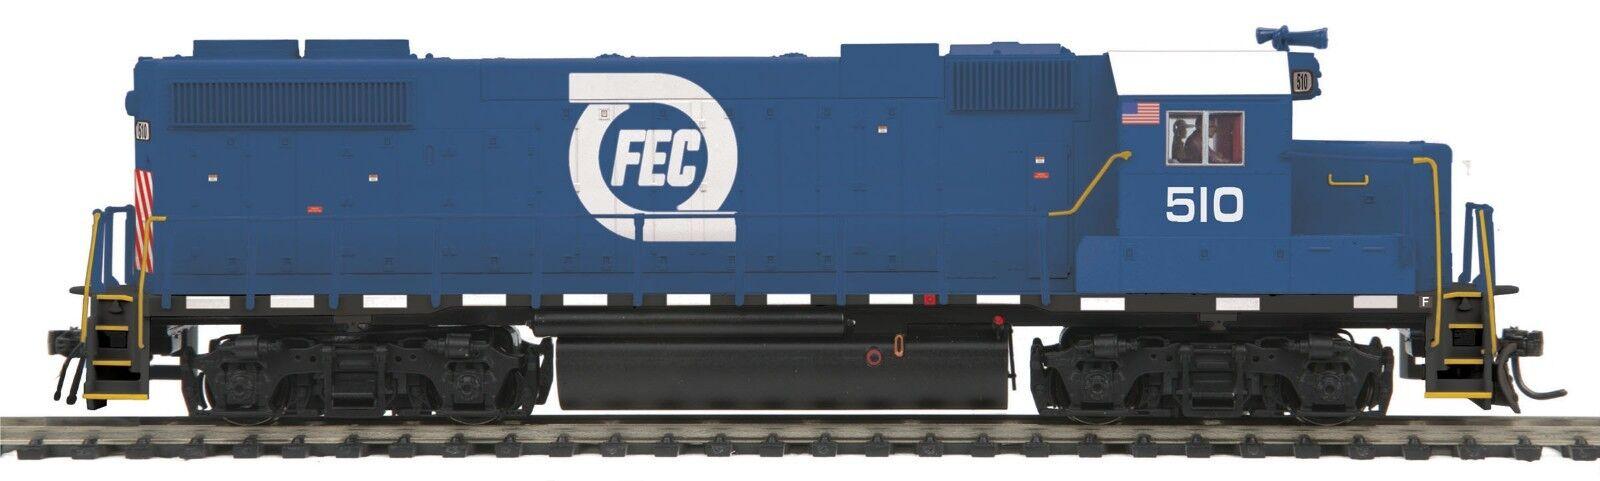 MTH 85-2061-0 Ho Florida East Coast GP38-2 DC, Dcc Listo Rd   510